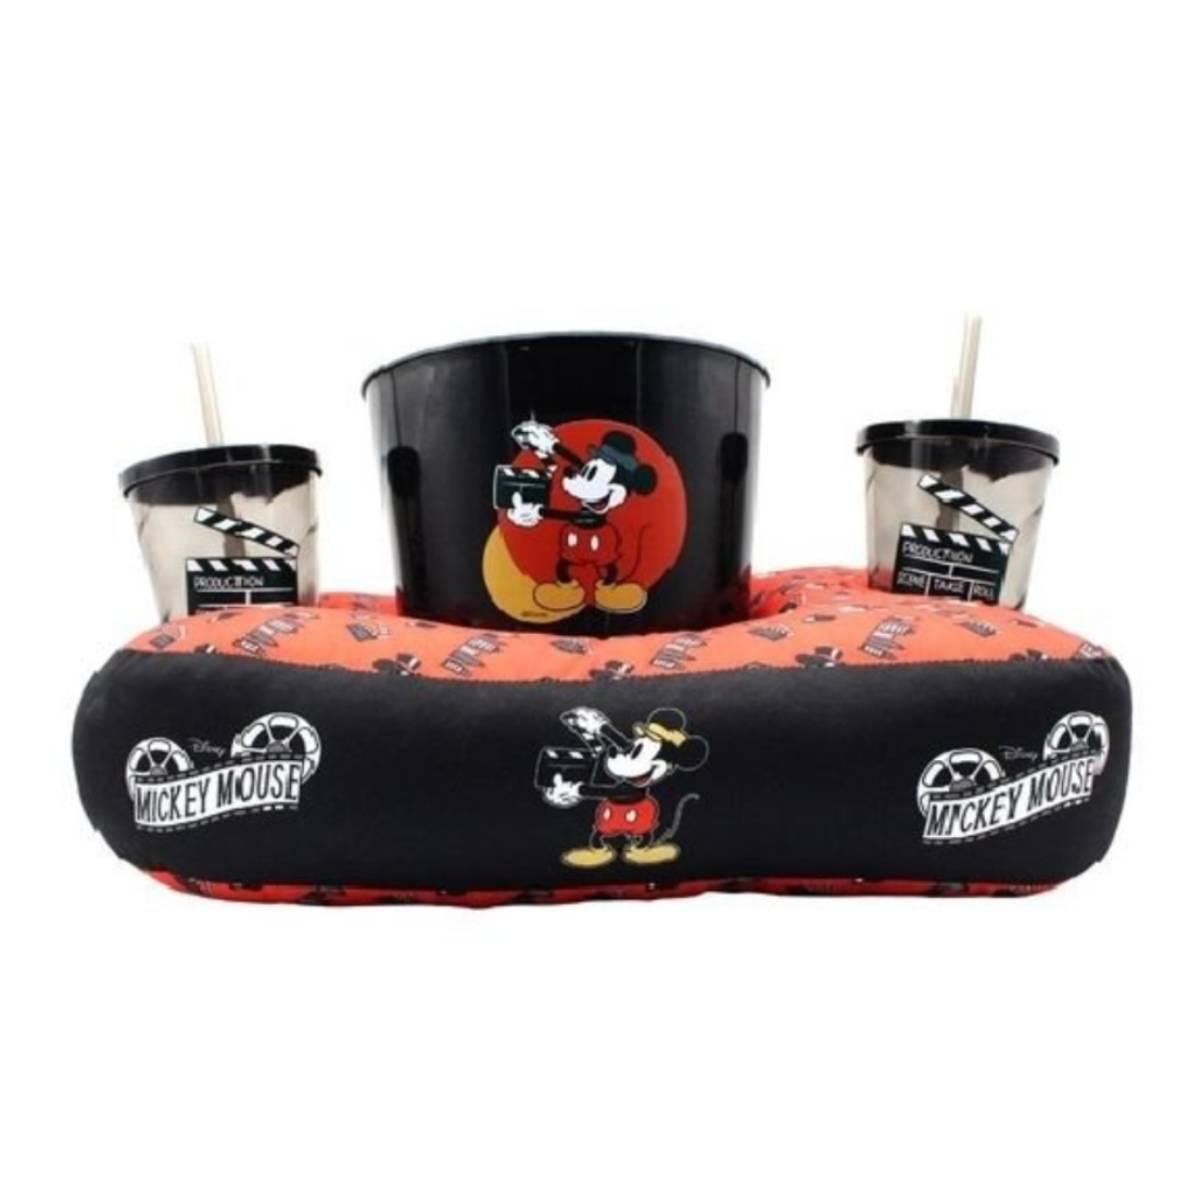 Kit Almofada Porta Pipoca Mickey Mouse Cinema Filme Disney